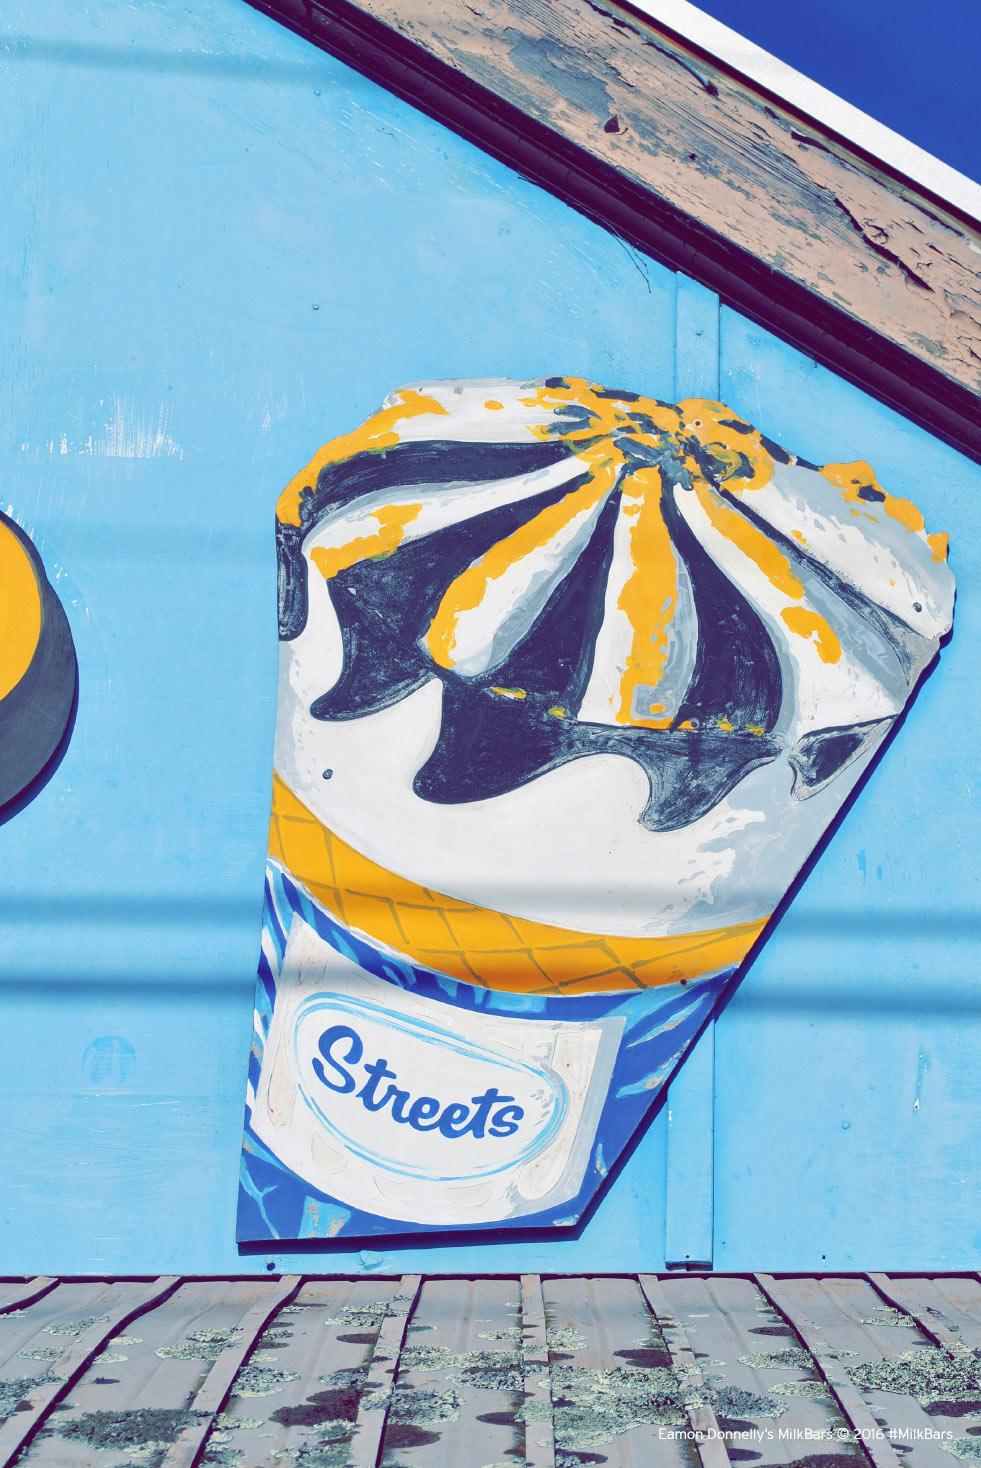 Ryrie-Street-Cornetto-2-Milk-Bar-Eamon-Donnelly's-Milk-Bars-Book-Project-(c)-2001-2016.jpg